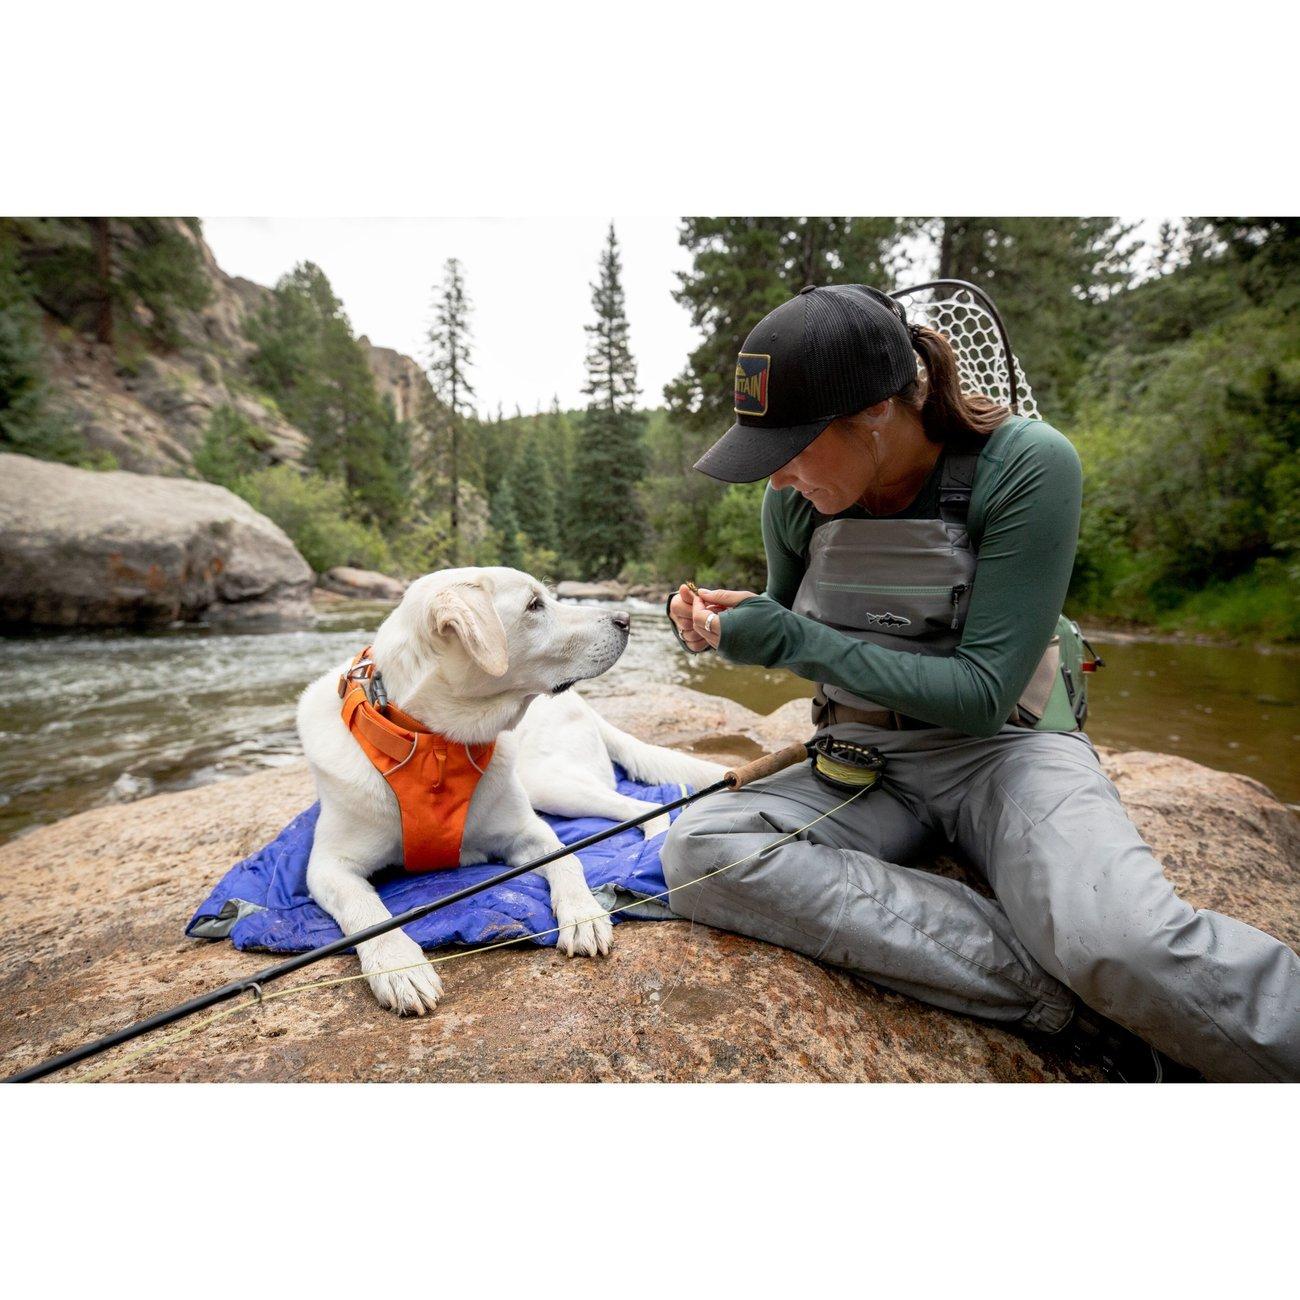 Ruffwear Highlands Sleeping Bag™ Schlafsack für Hunde, Bild 12